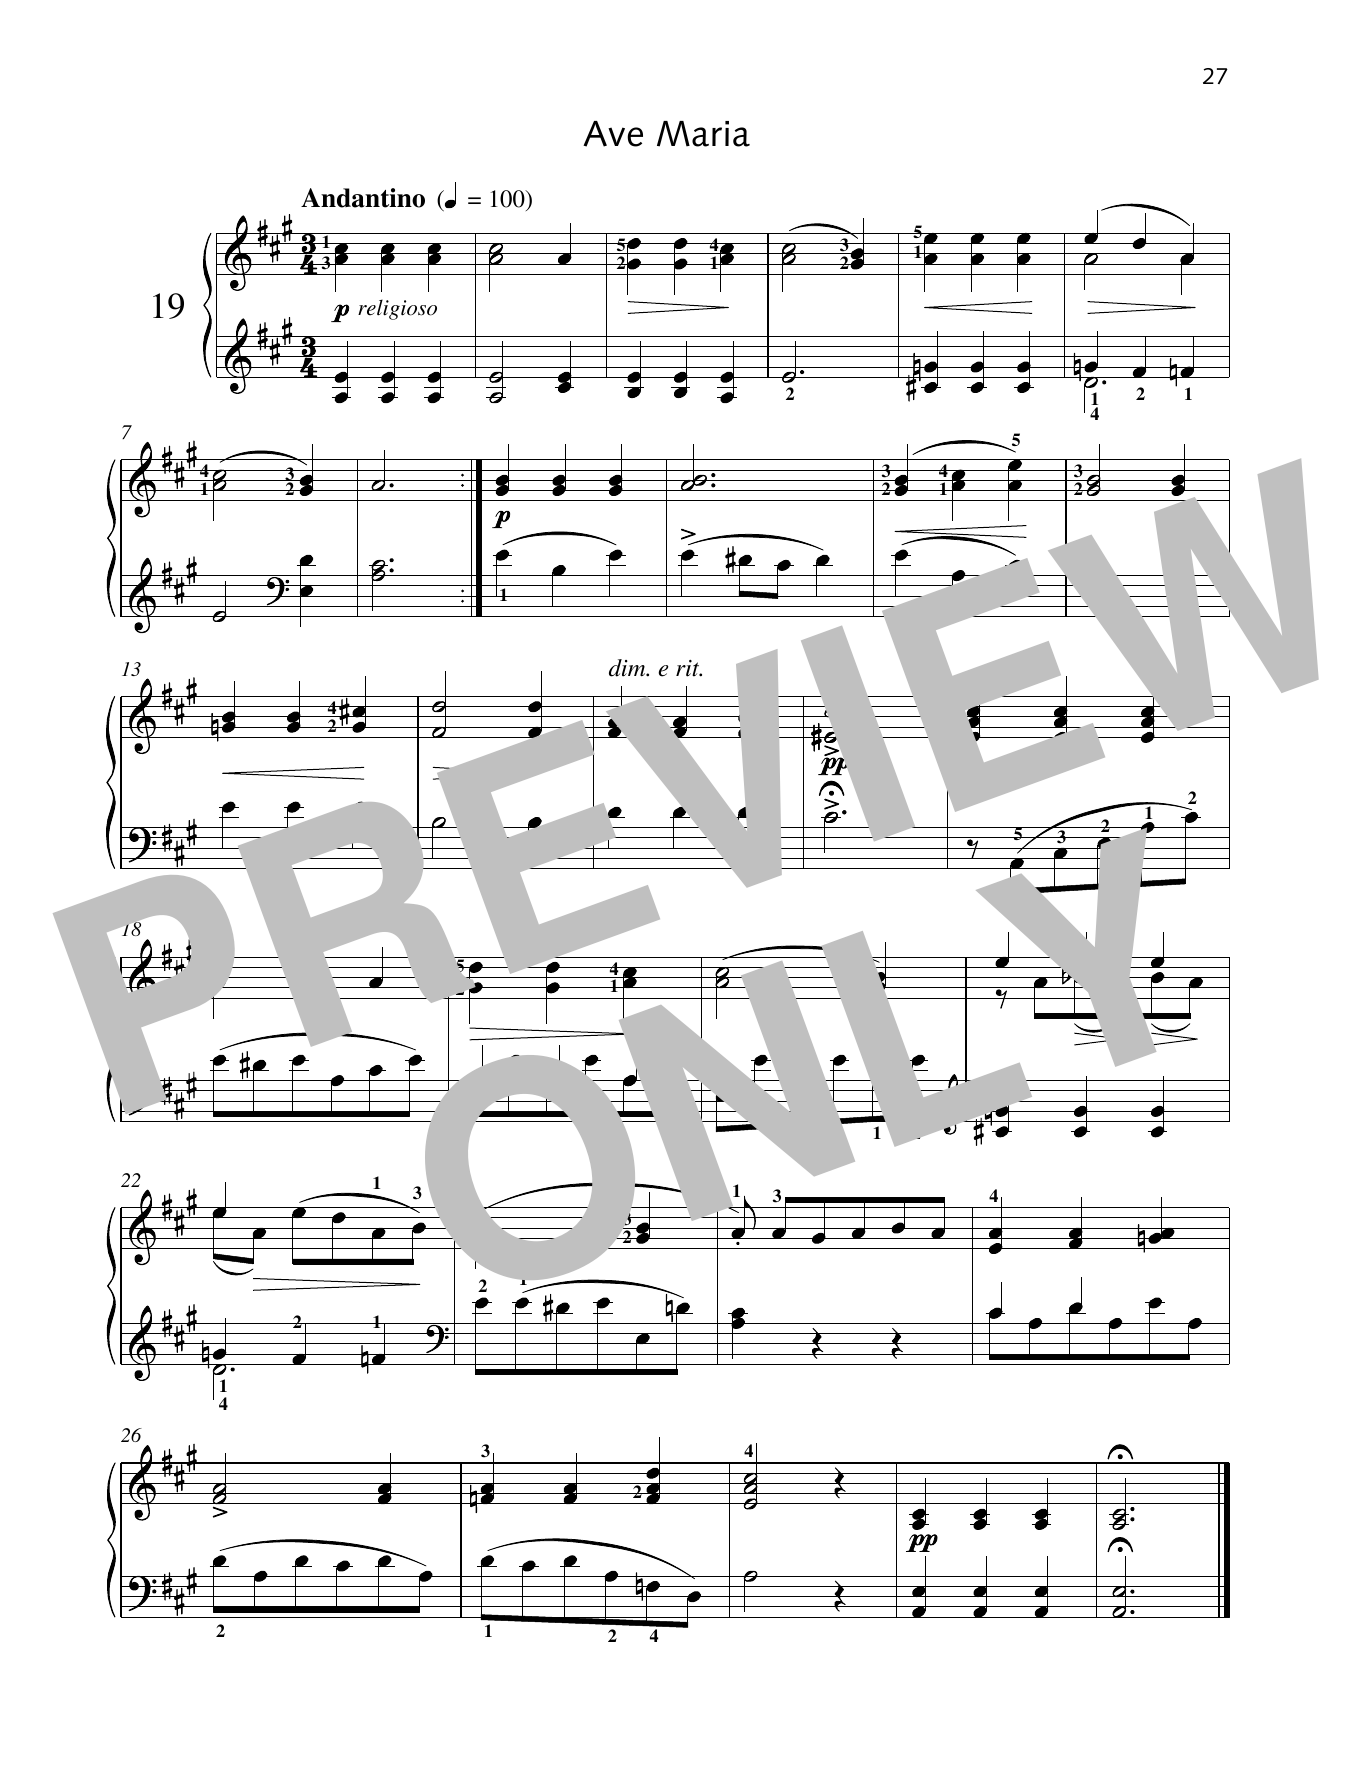 Ave Maria Sheet Music